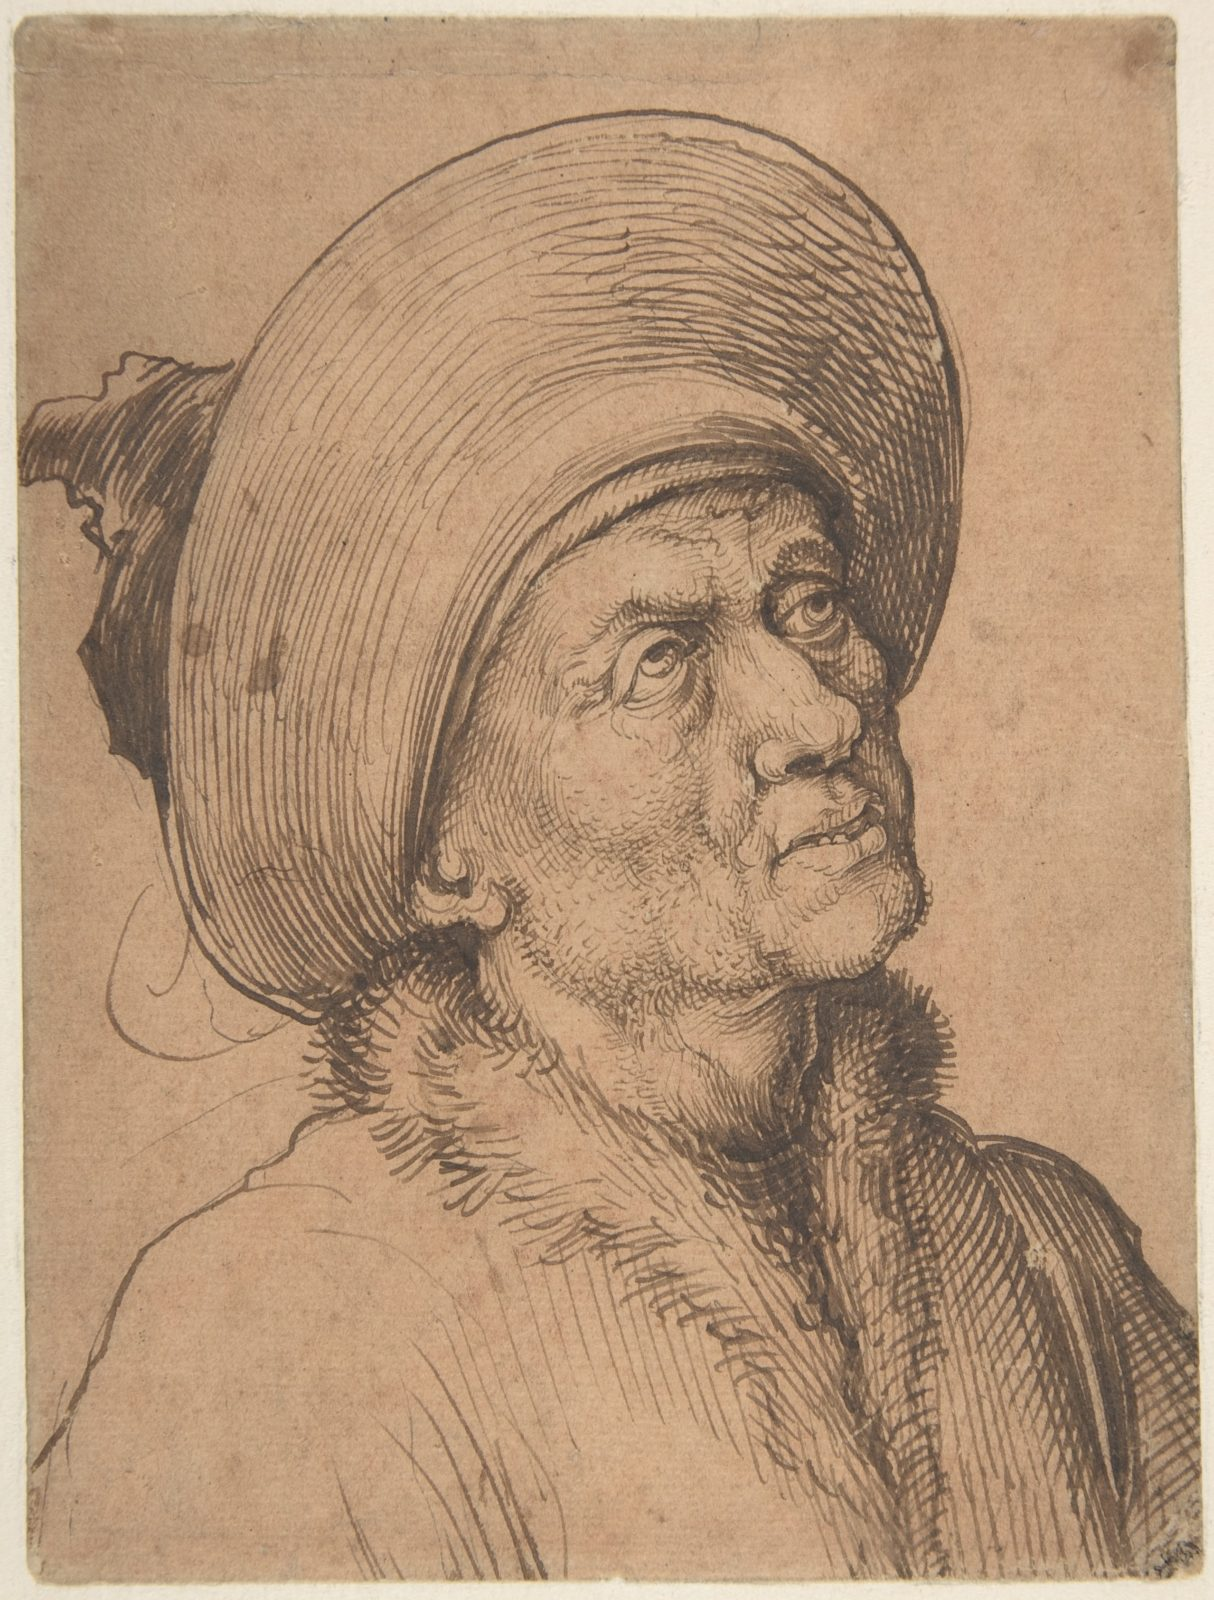 Bust of a Man in a Hat Gazing Upward